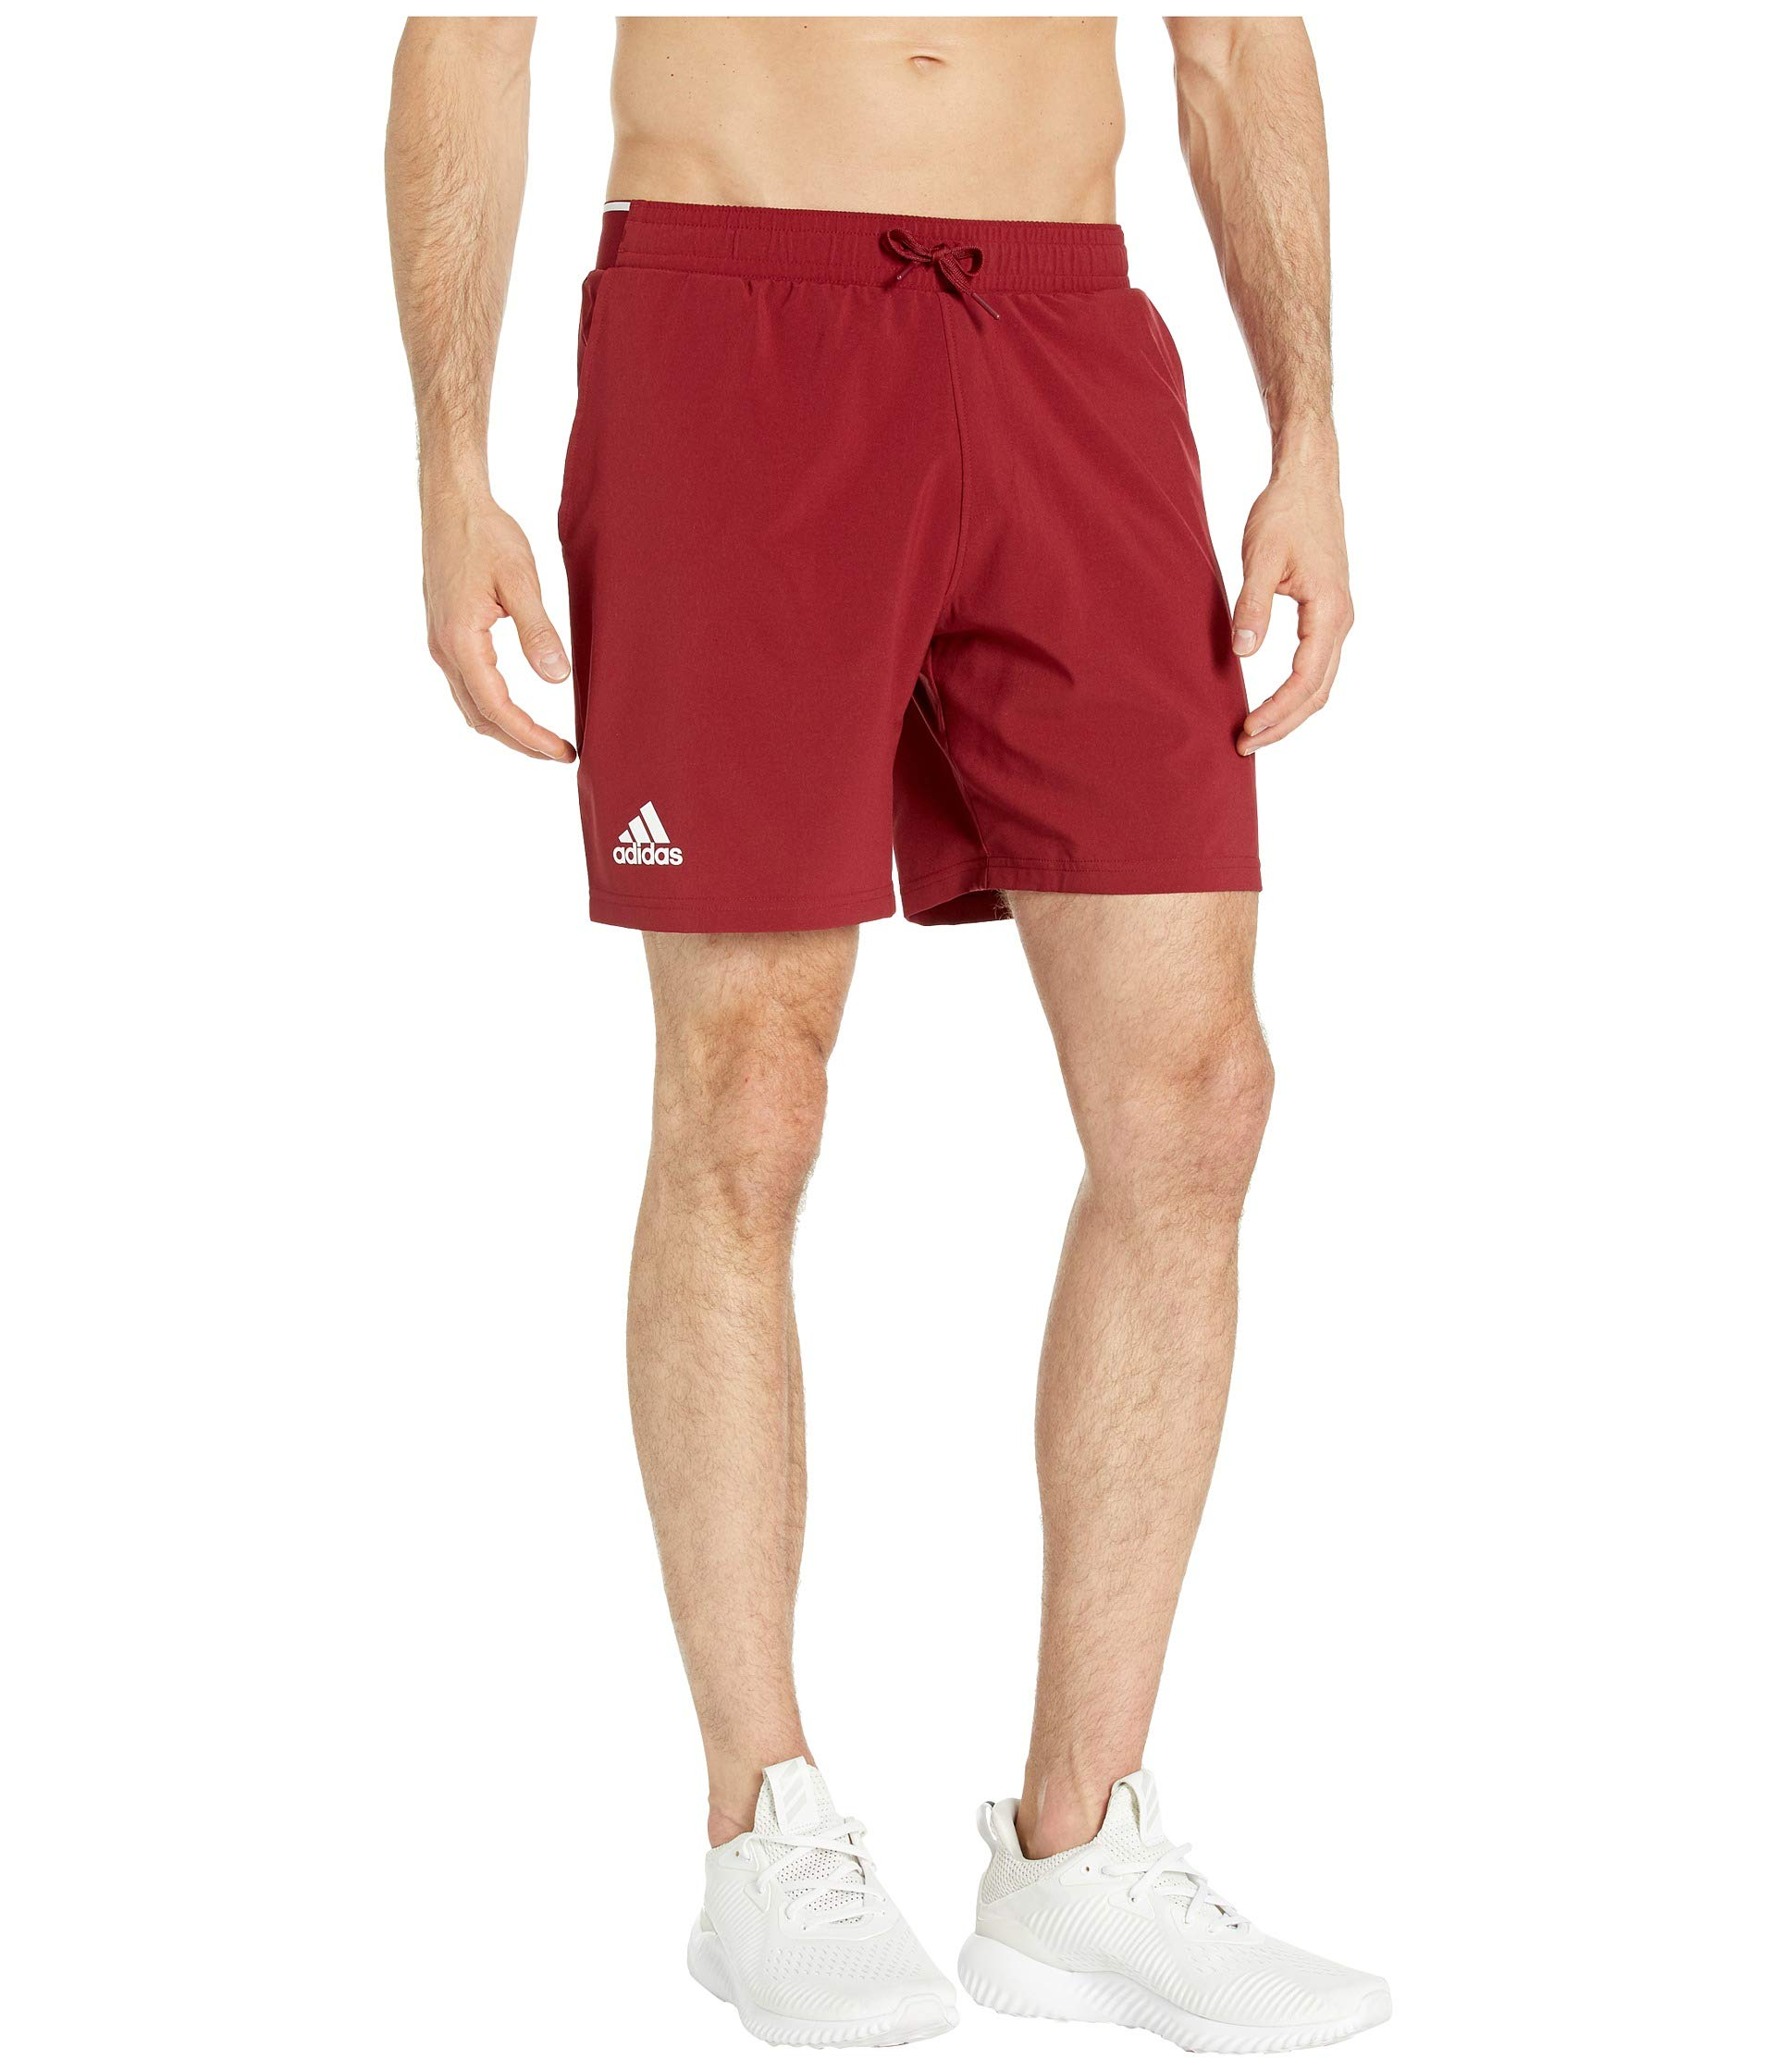 adidas Club 7 Inch Tennis Short, Collegiate Burgundy/Hi-Res Coral, X-Small